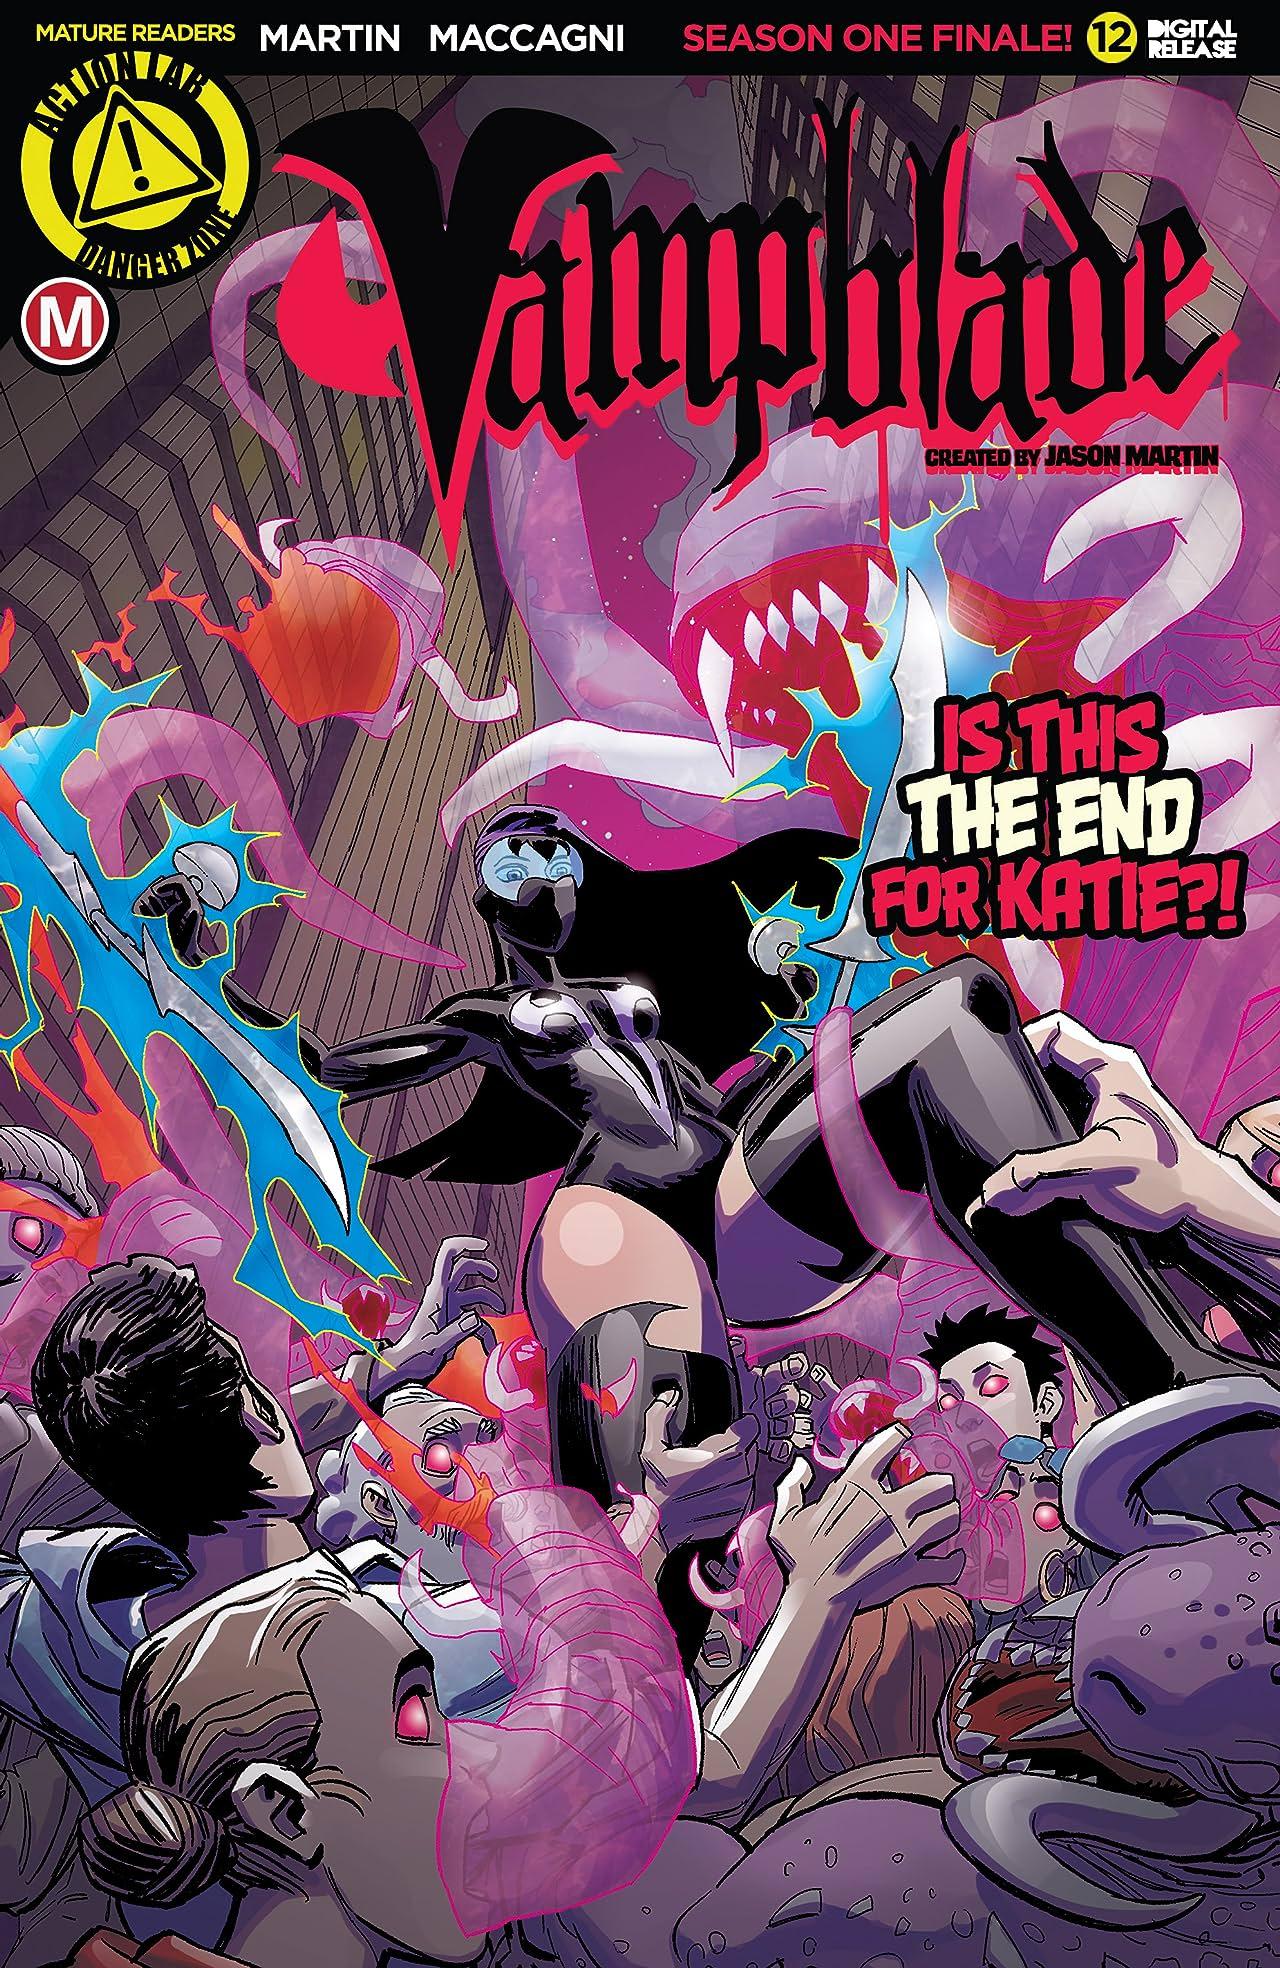 Vampblade #12